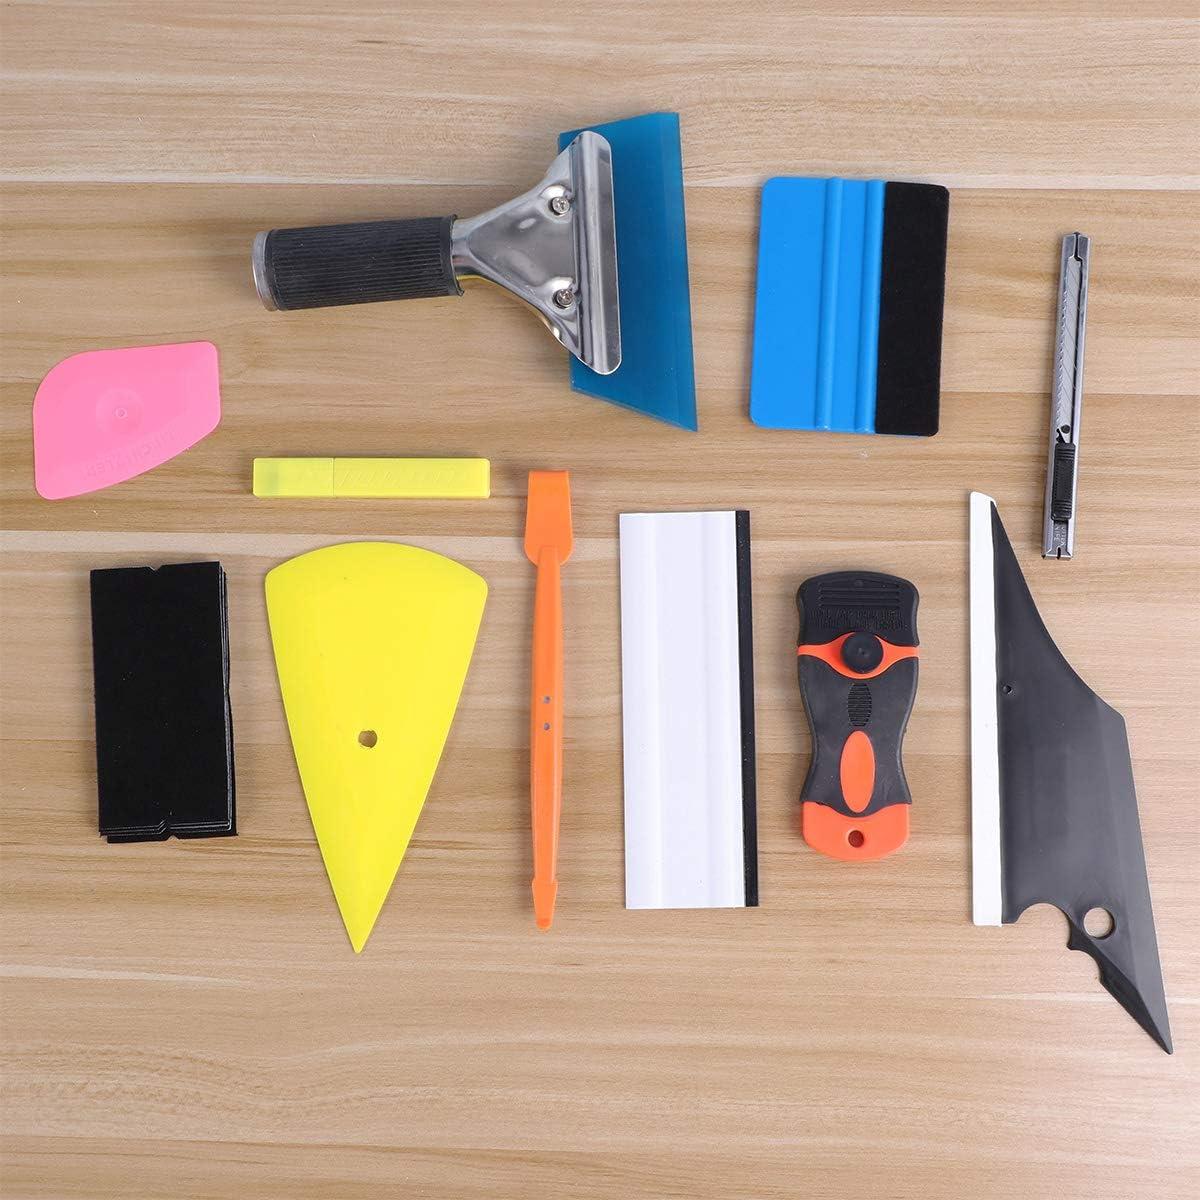 Vosarea 11pcs Car Vinyl Wrap Tool Window Tint Kit for Auto Film Tinting Scraper Application Installation